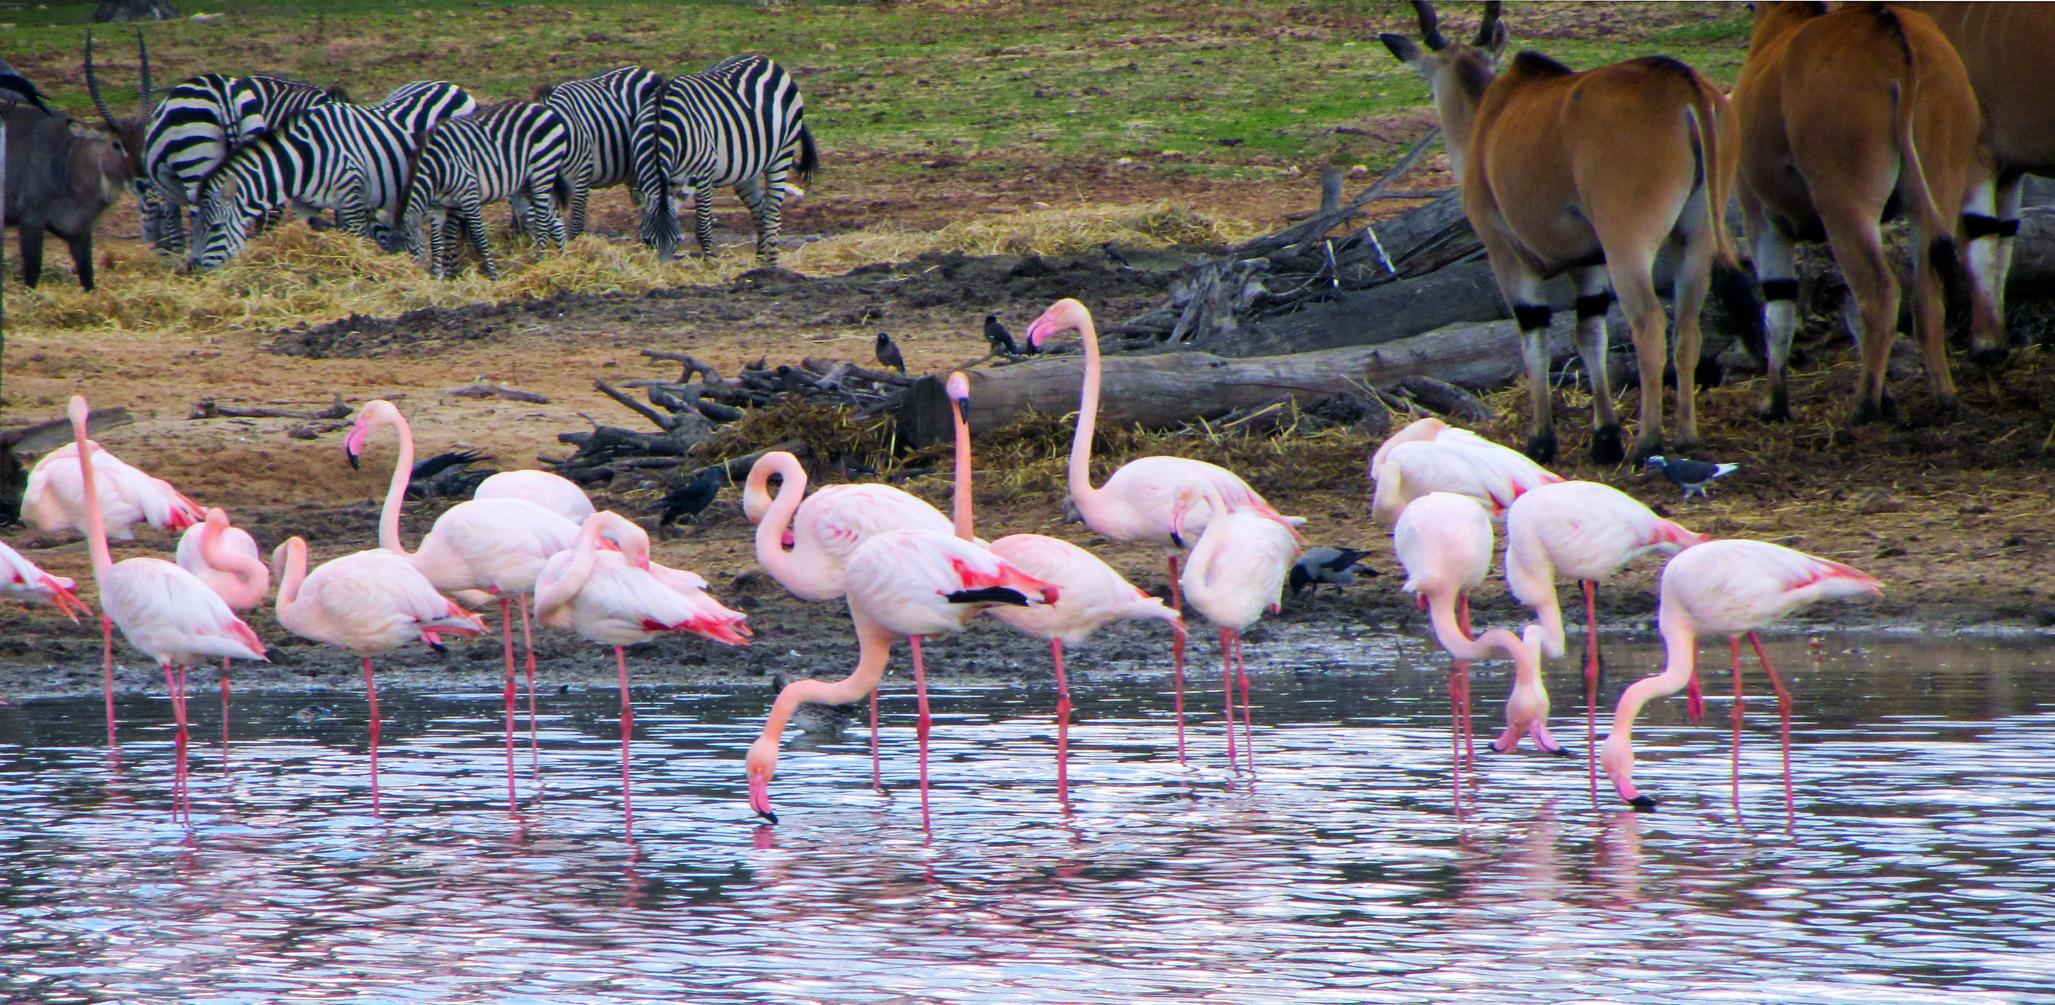 Flamingos, zebras and a wildebeast photo